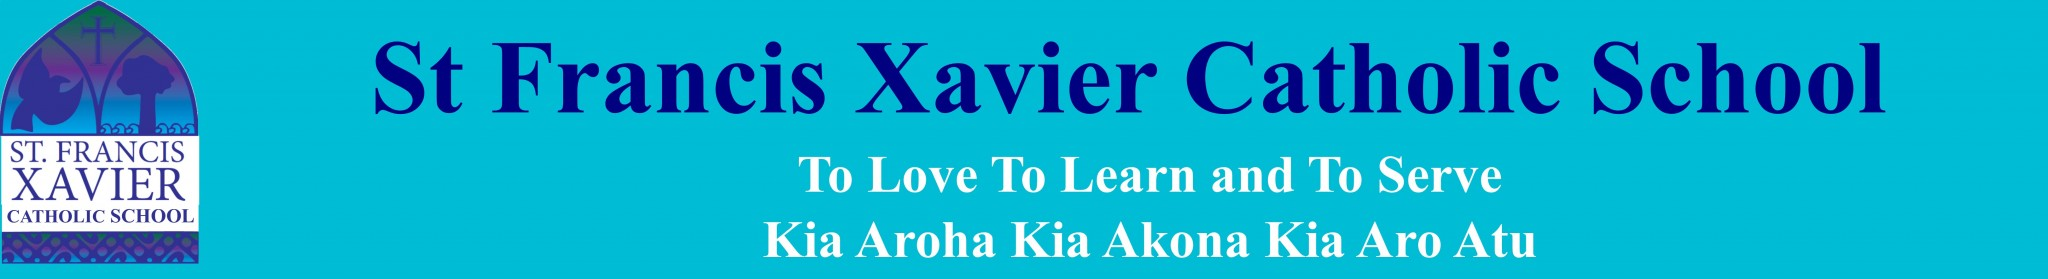 St Francis Xavier Catholic School Logo